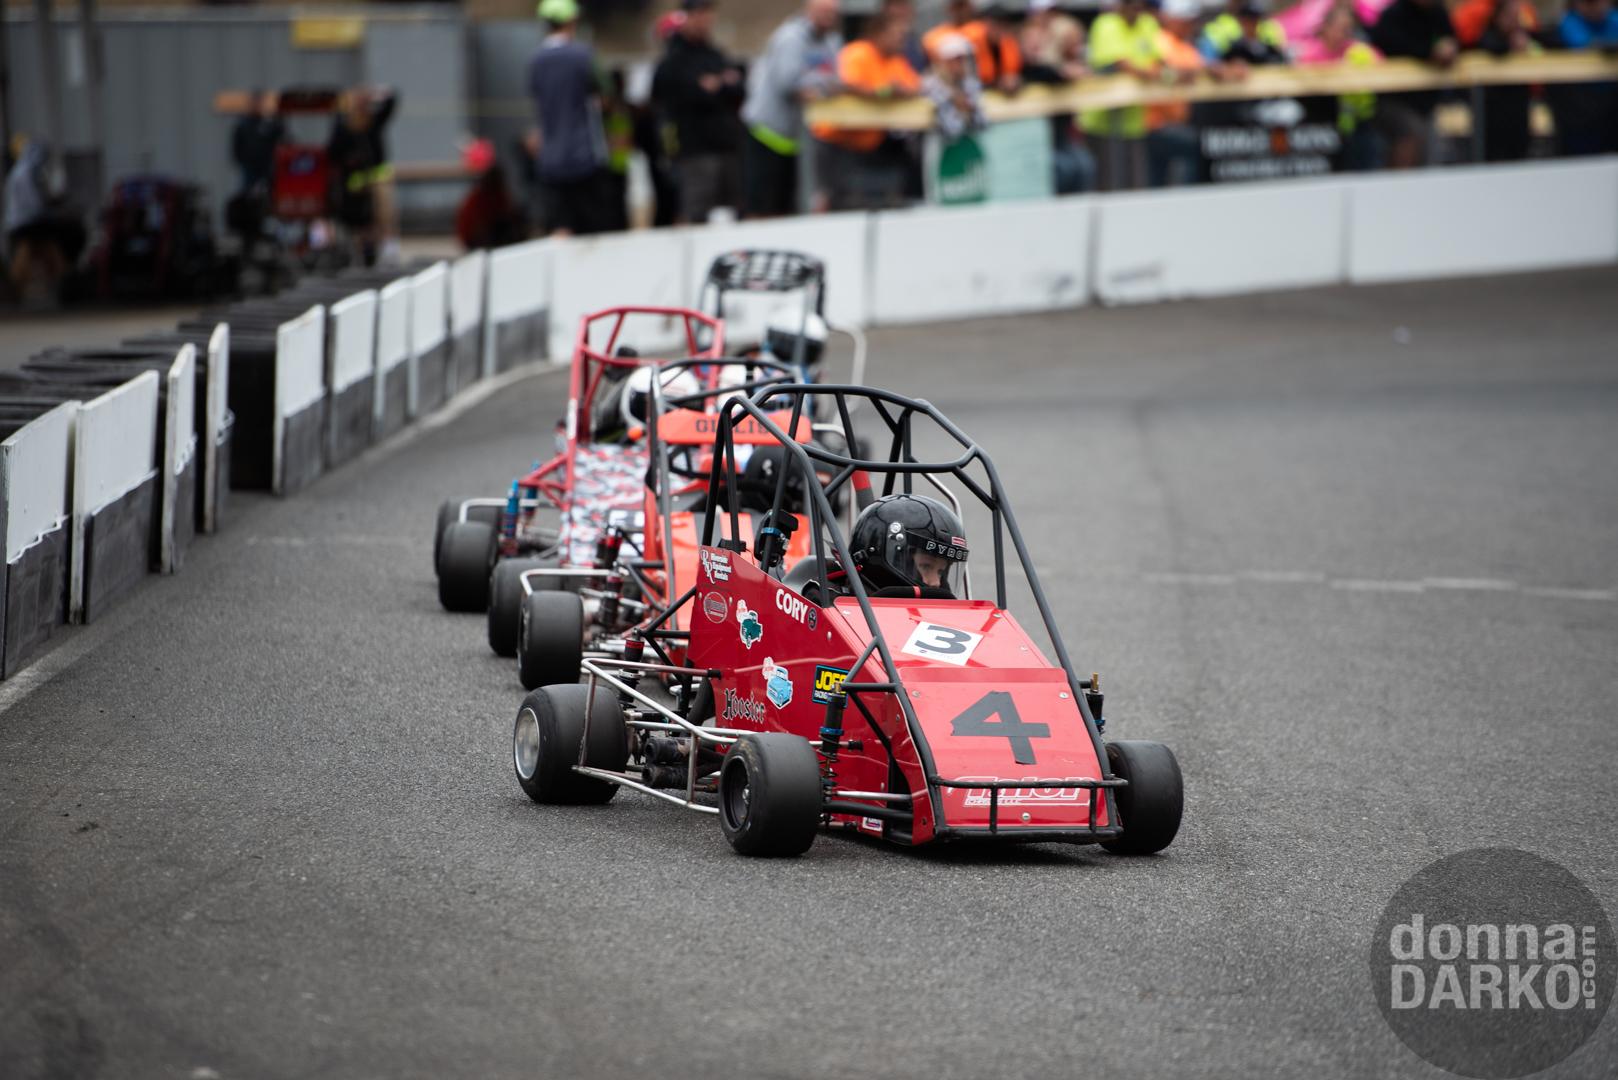 QWMA (Racing) 8-11-2019 DSC_5618.jpg